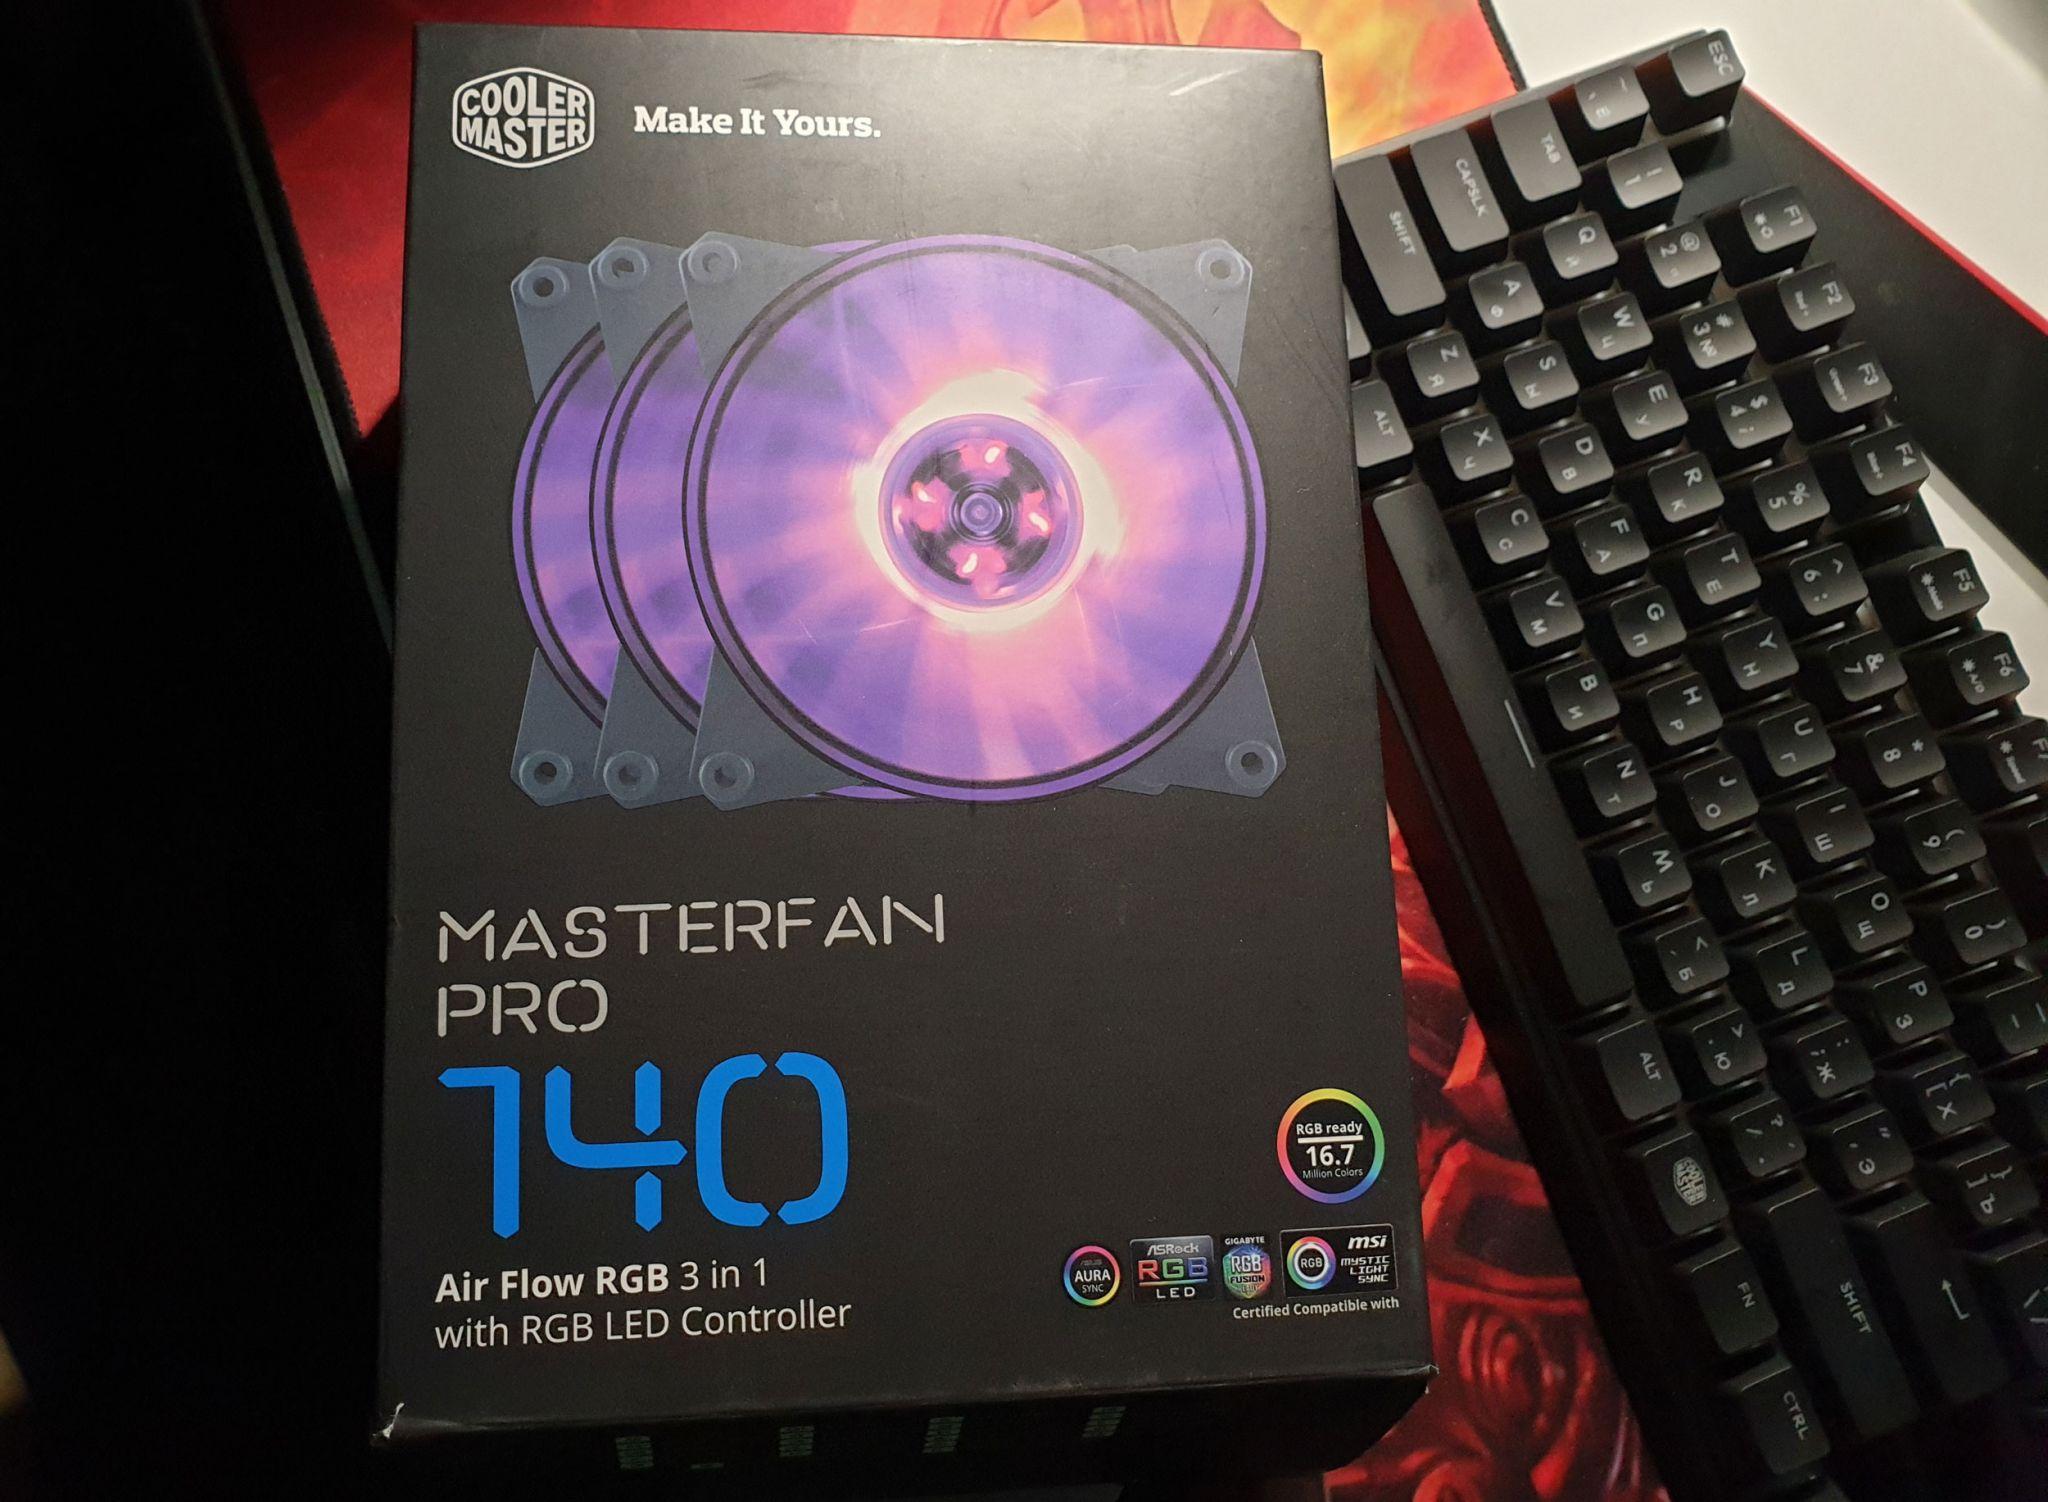 Вентилятор для корпуса Cooler Master MasterFan Pro 140 Air Flow RGB 3 in 1  (MFY-F4DC-083PCR1)